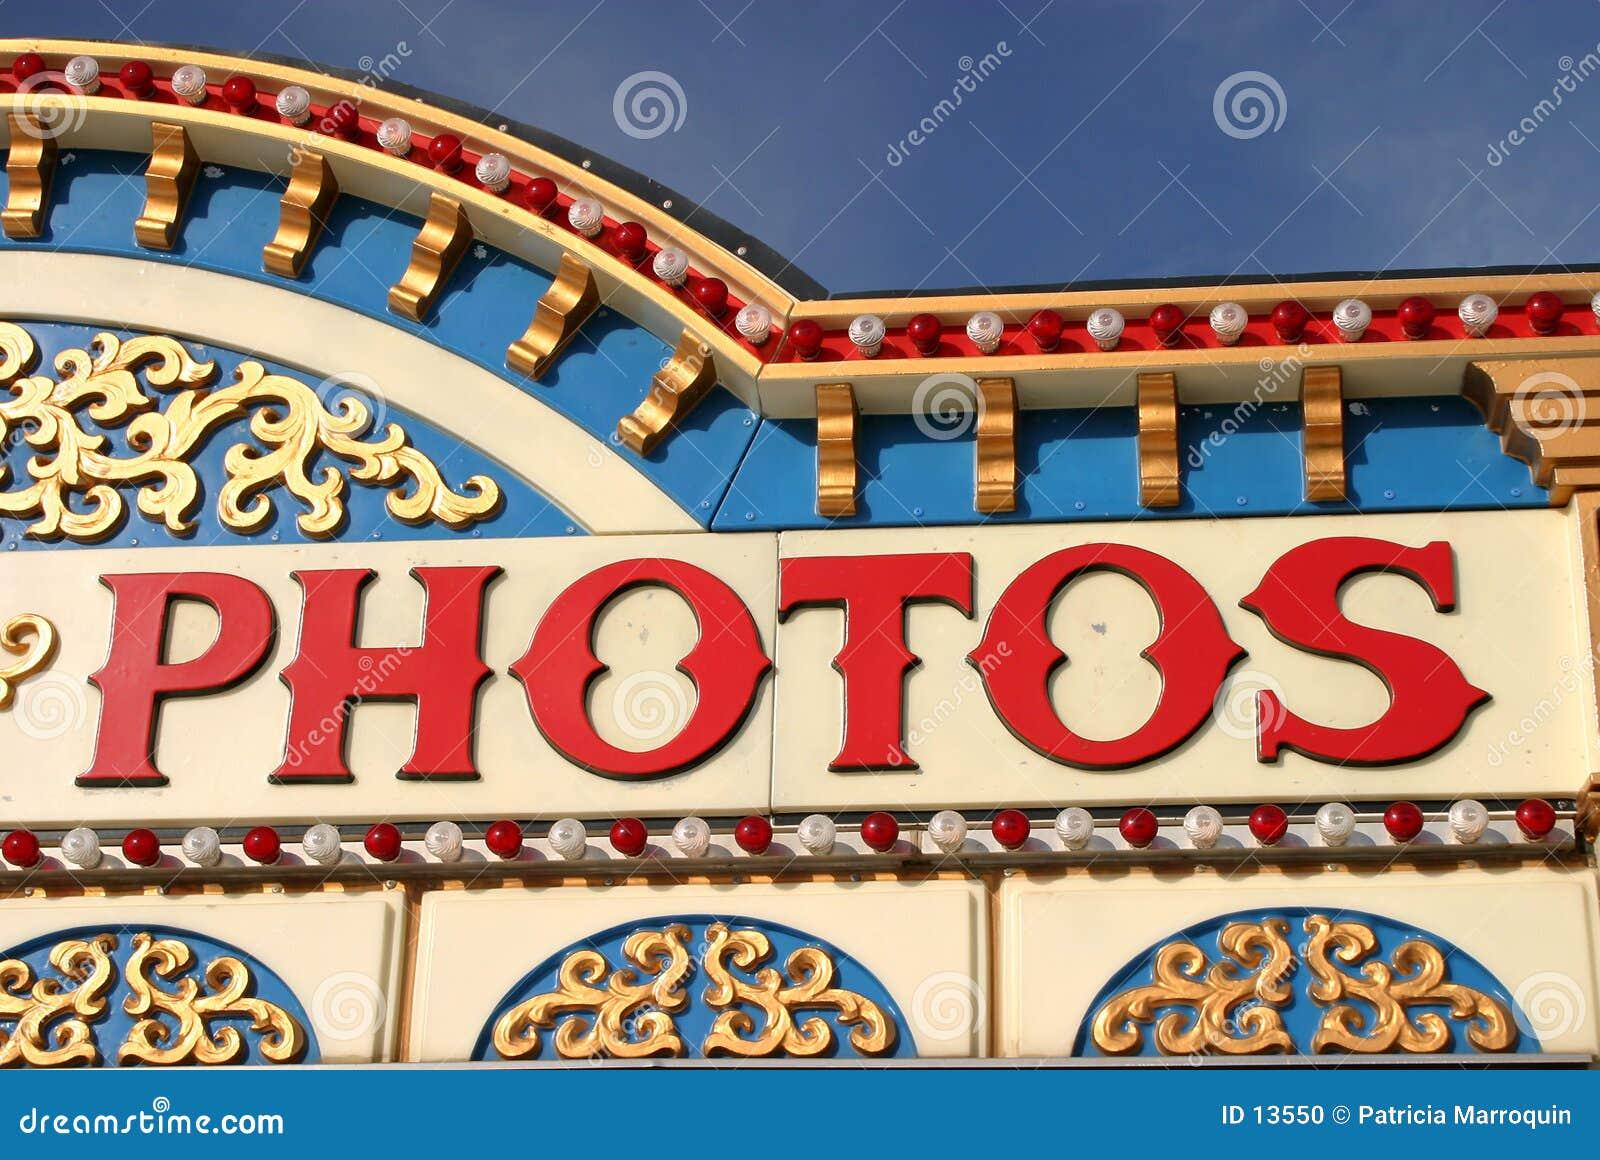 Fotos fabuleux